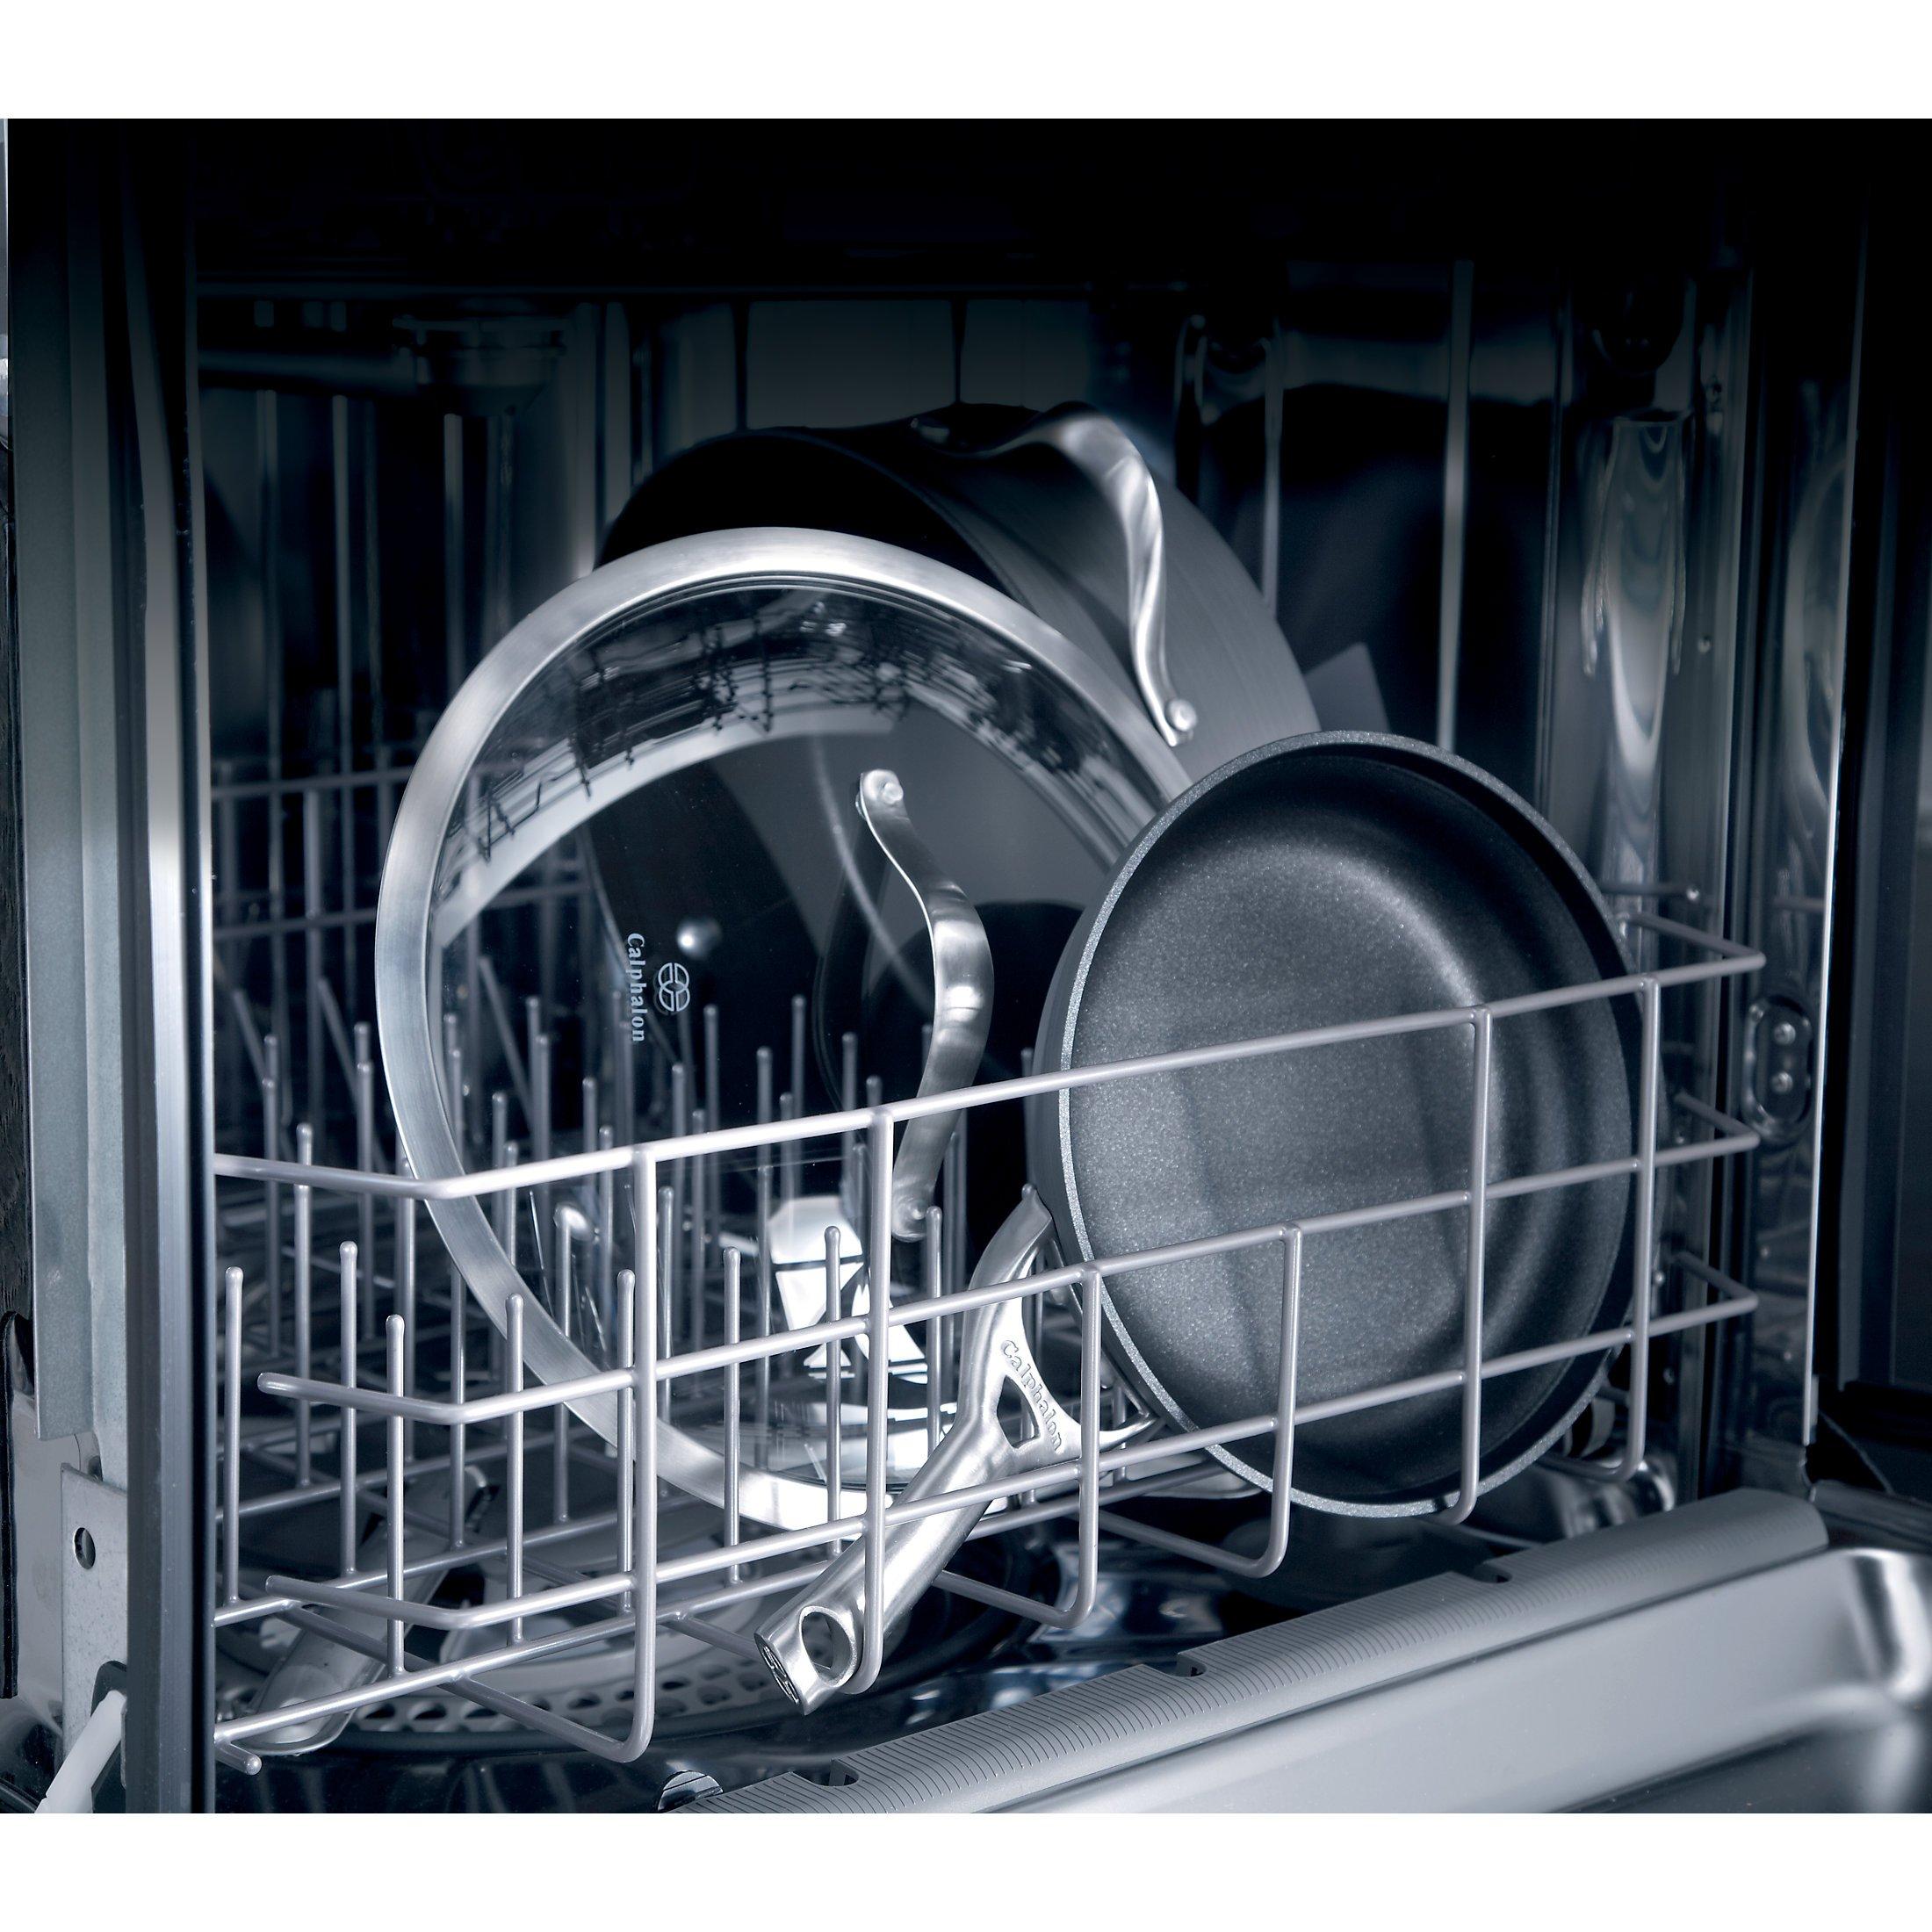 Calphalon 1876788 Contemporary Hard-Anodized Aluminum Nonstick Cookware Set, 12-Piece, Black by Calphalon (Image #4)